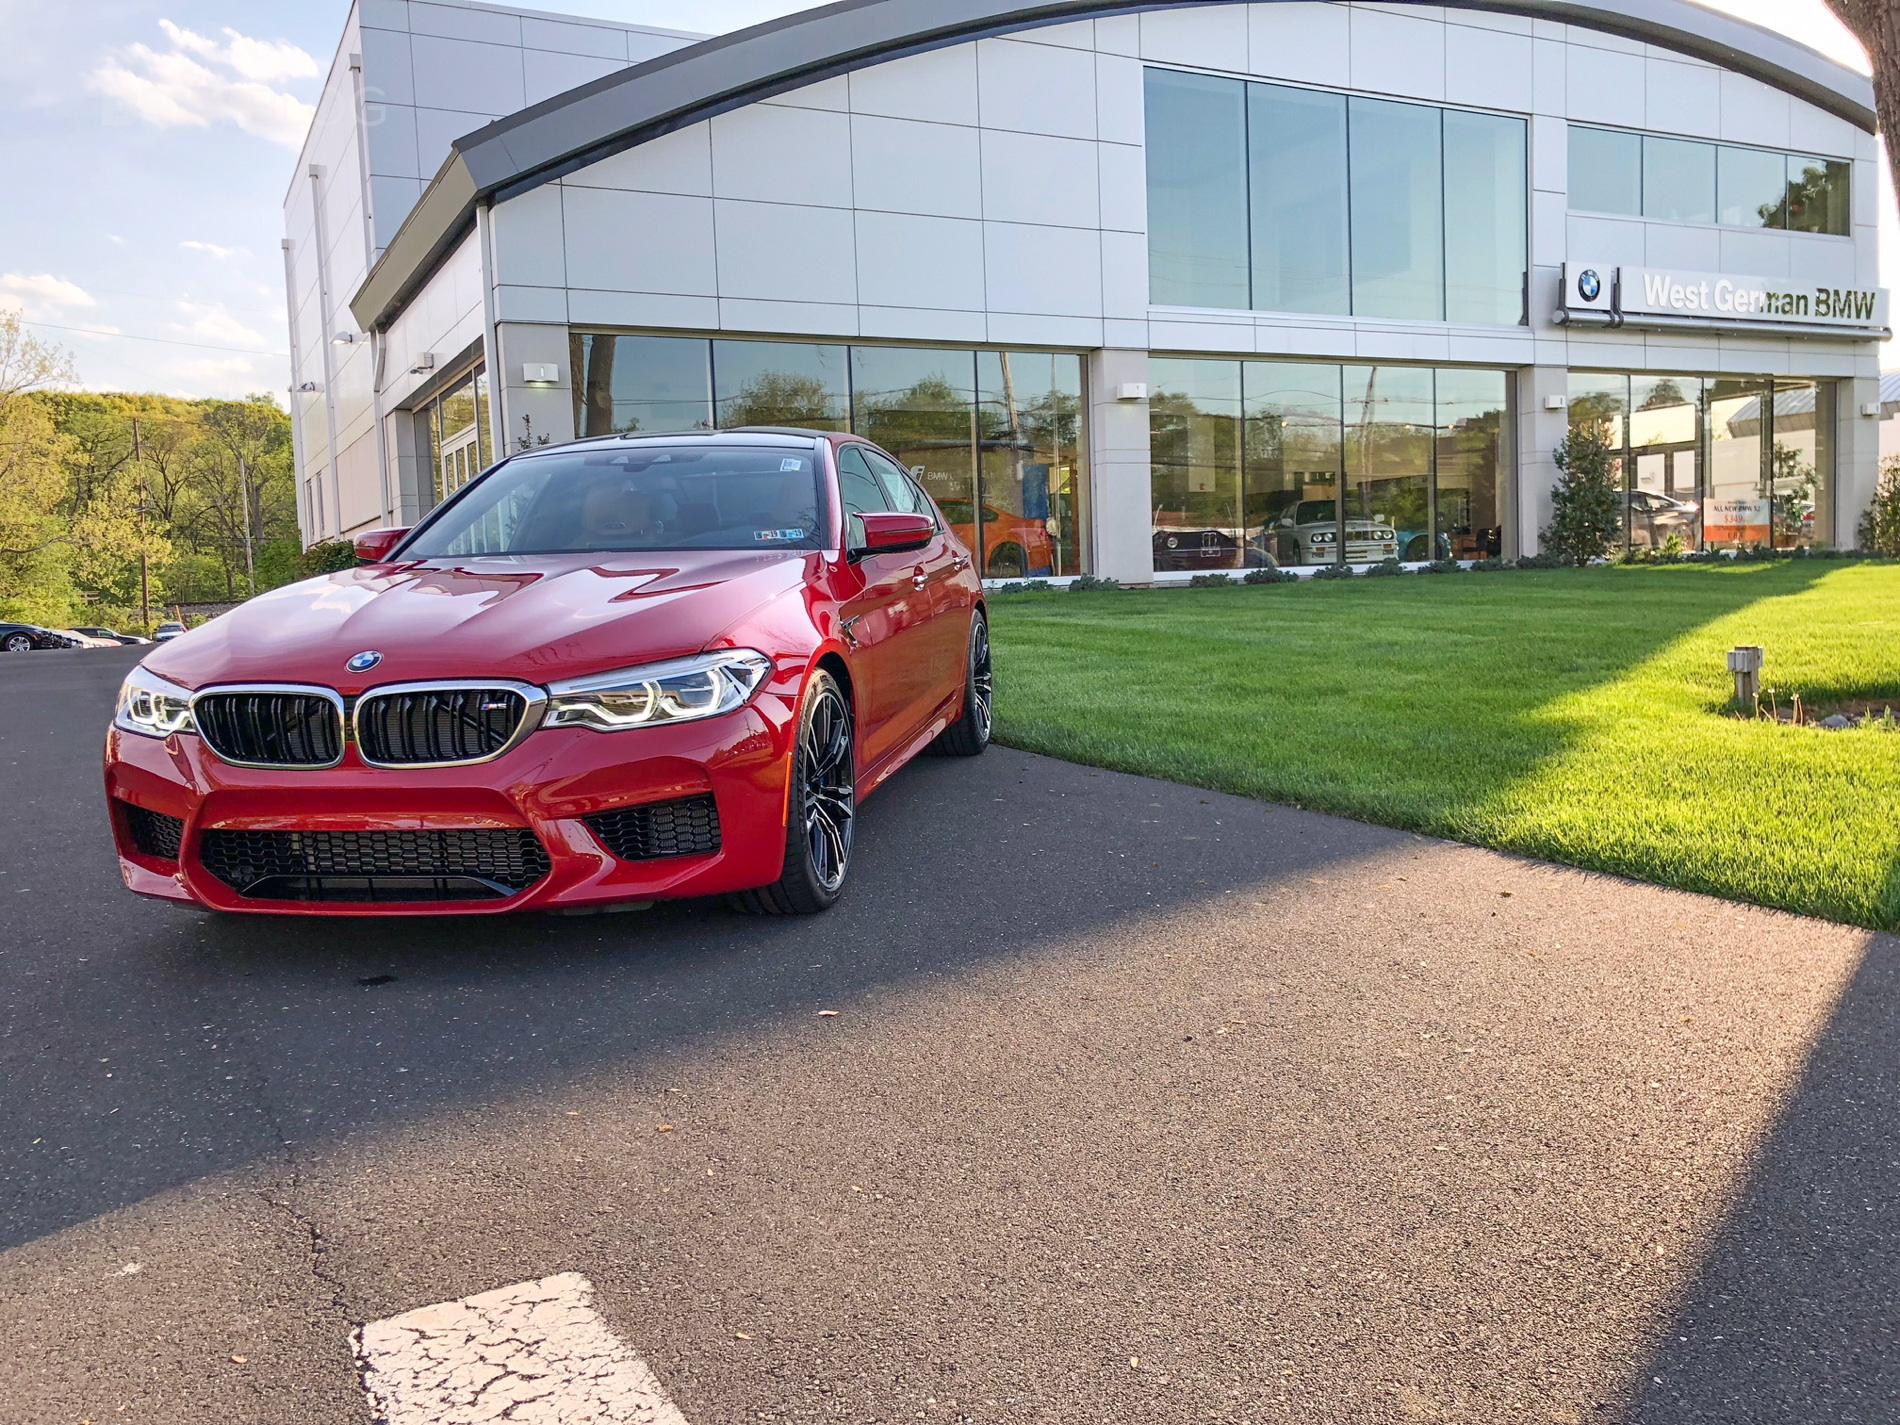 BMW F90 M5 Imola Red 03